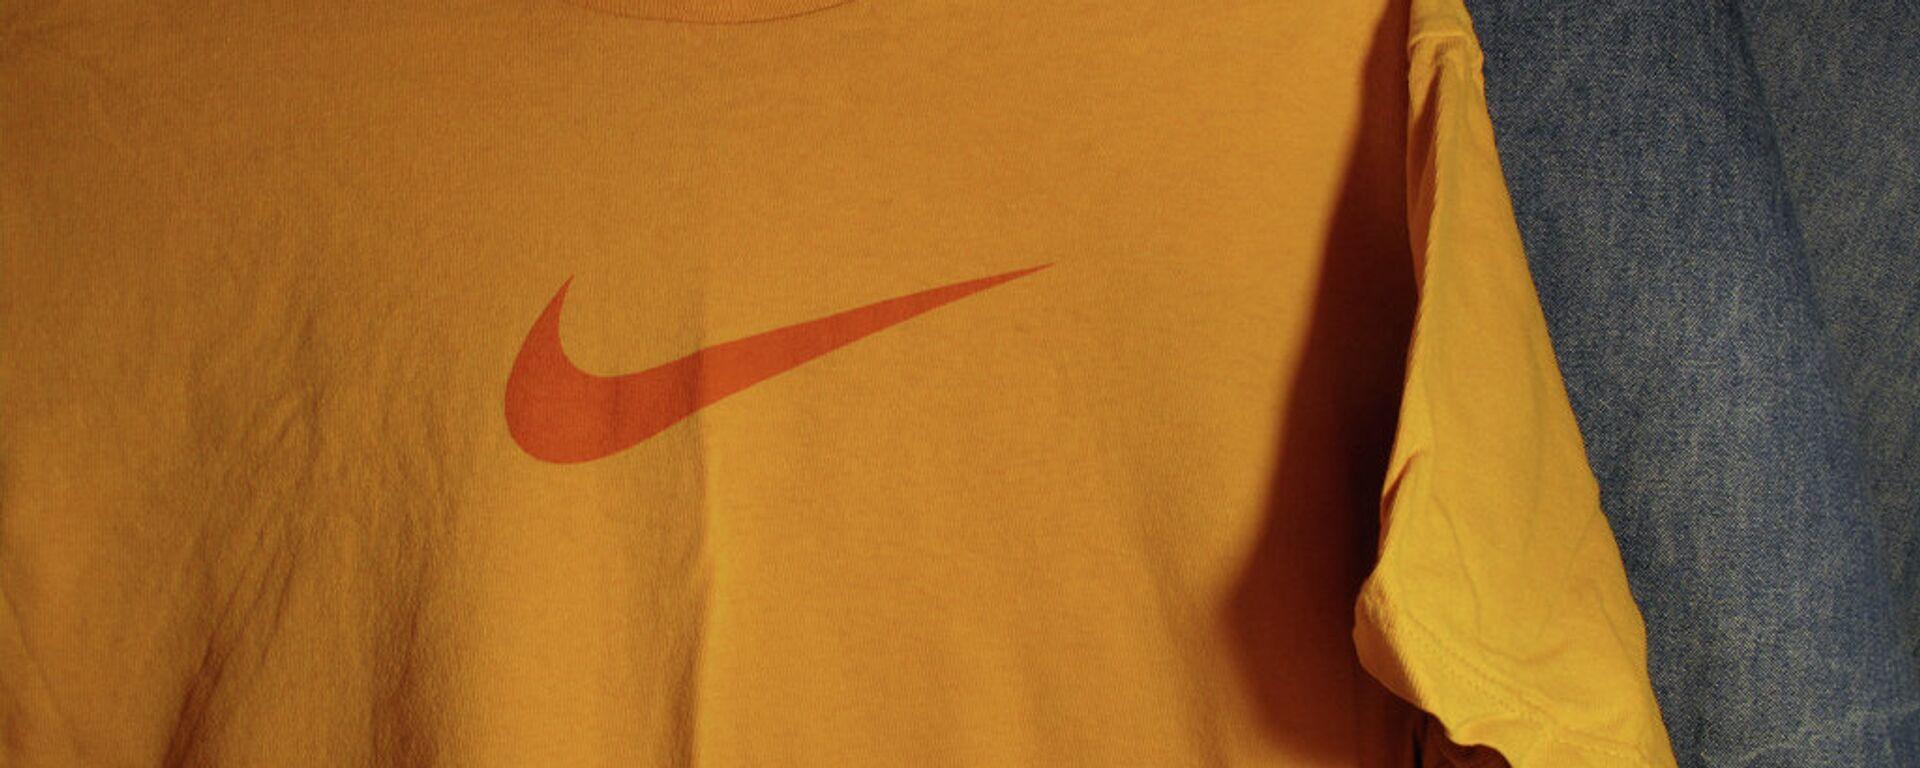 Nike - Sputnik Việt Nam, 1920, 15.07.2019